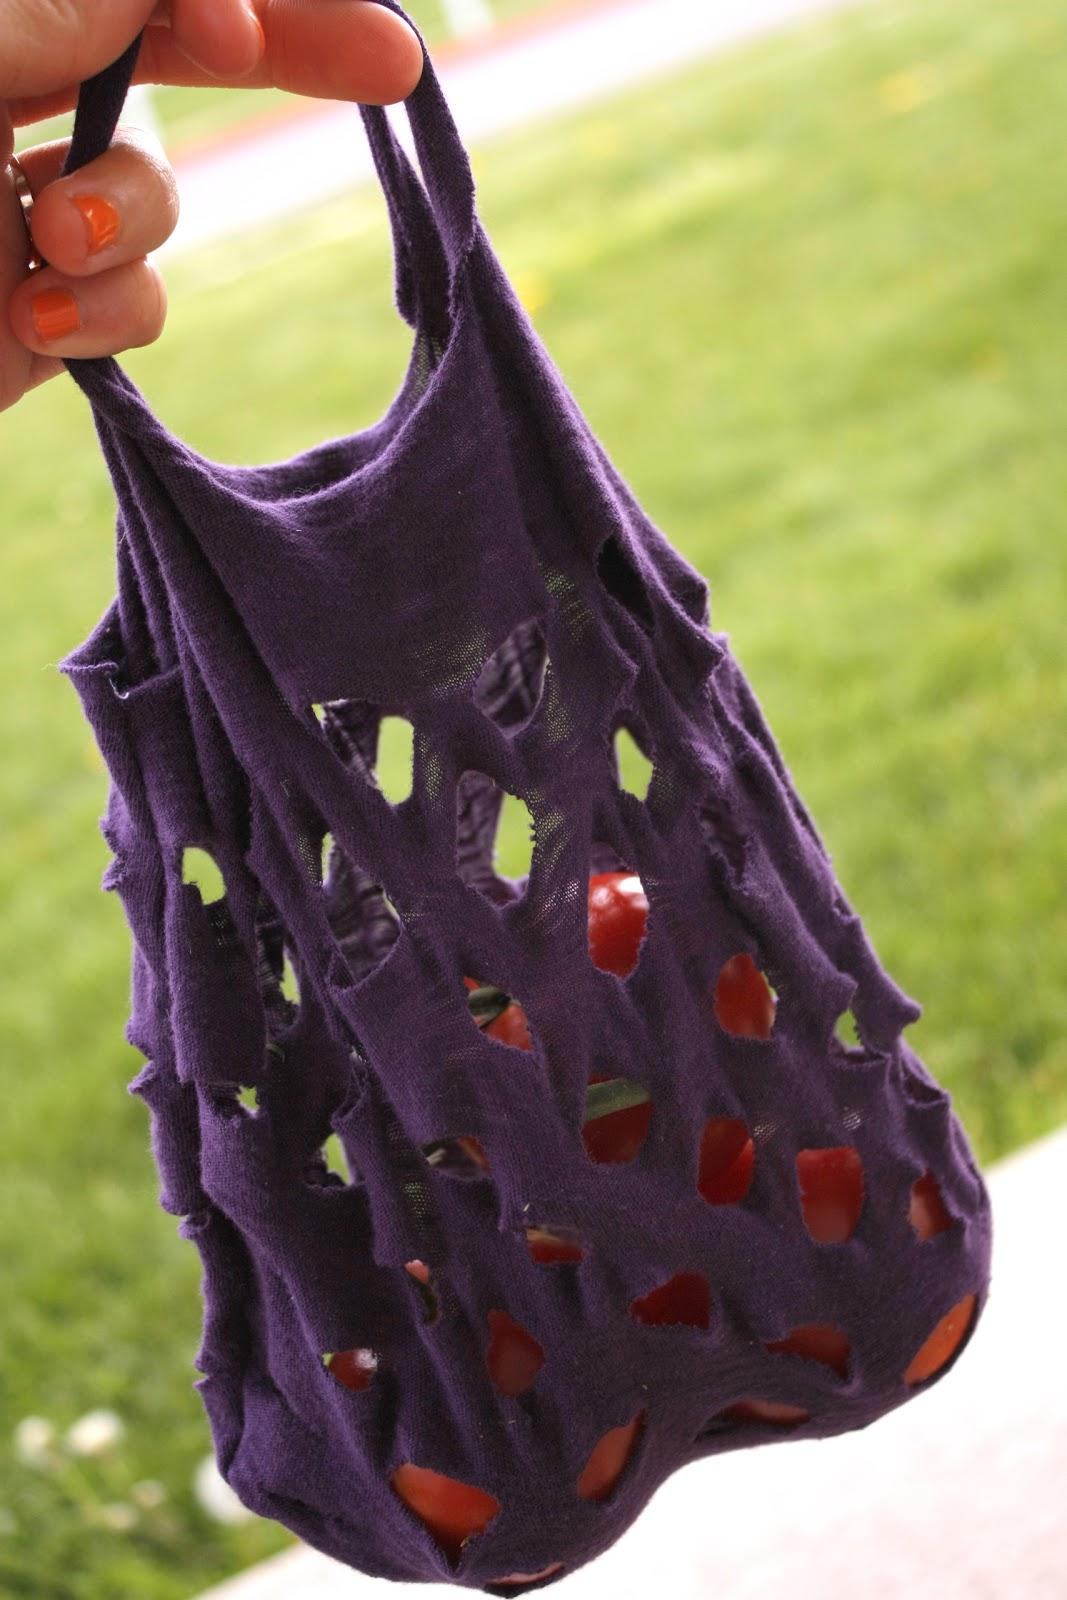 A free produce bag.